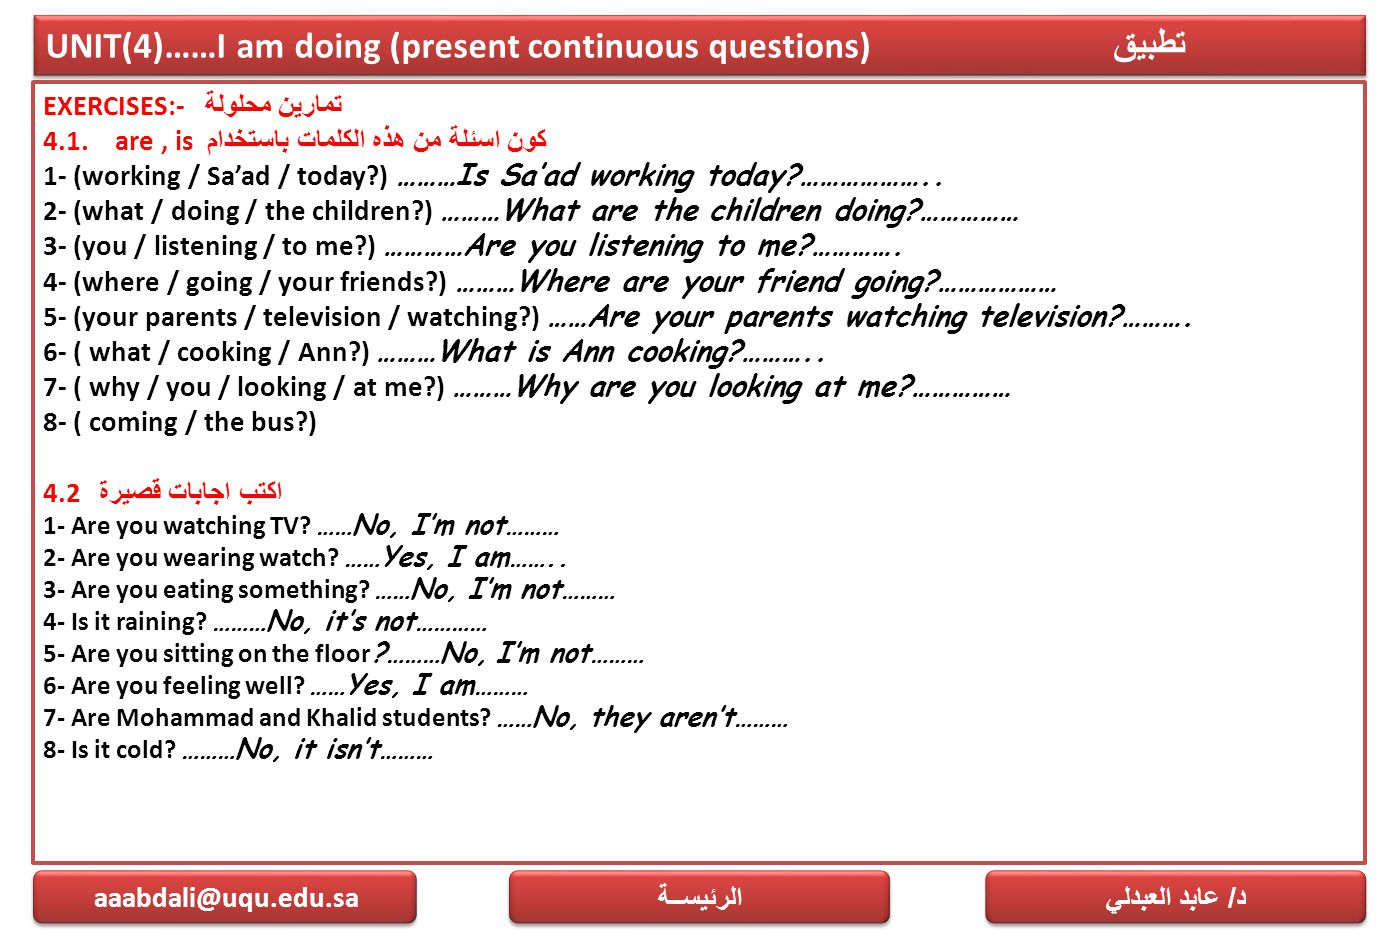 UNIT(4)……I am doing (present continuous questions) تطبيق EXERCISES:- تمارين محلولة 4.1. are, is كون اسئلة من هذه الكلمات باستخدام 1- (working / Sa'ad